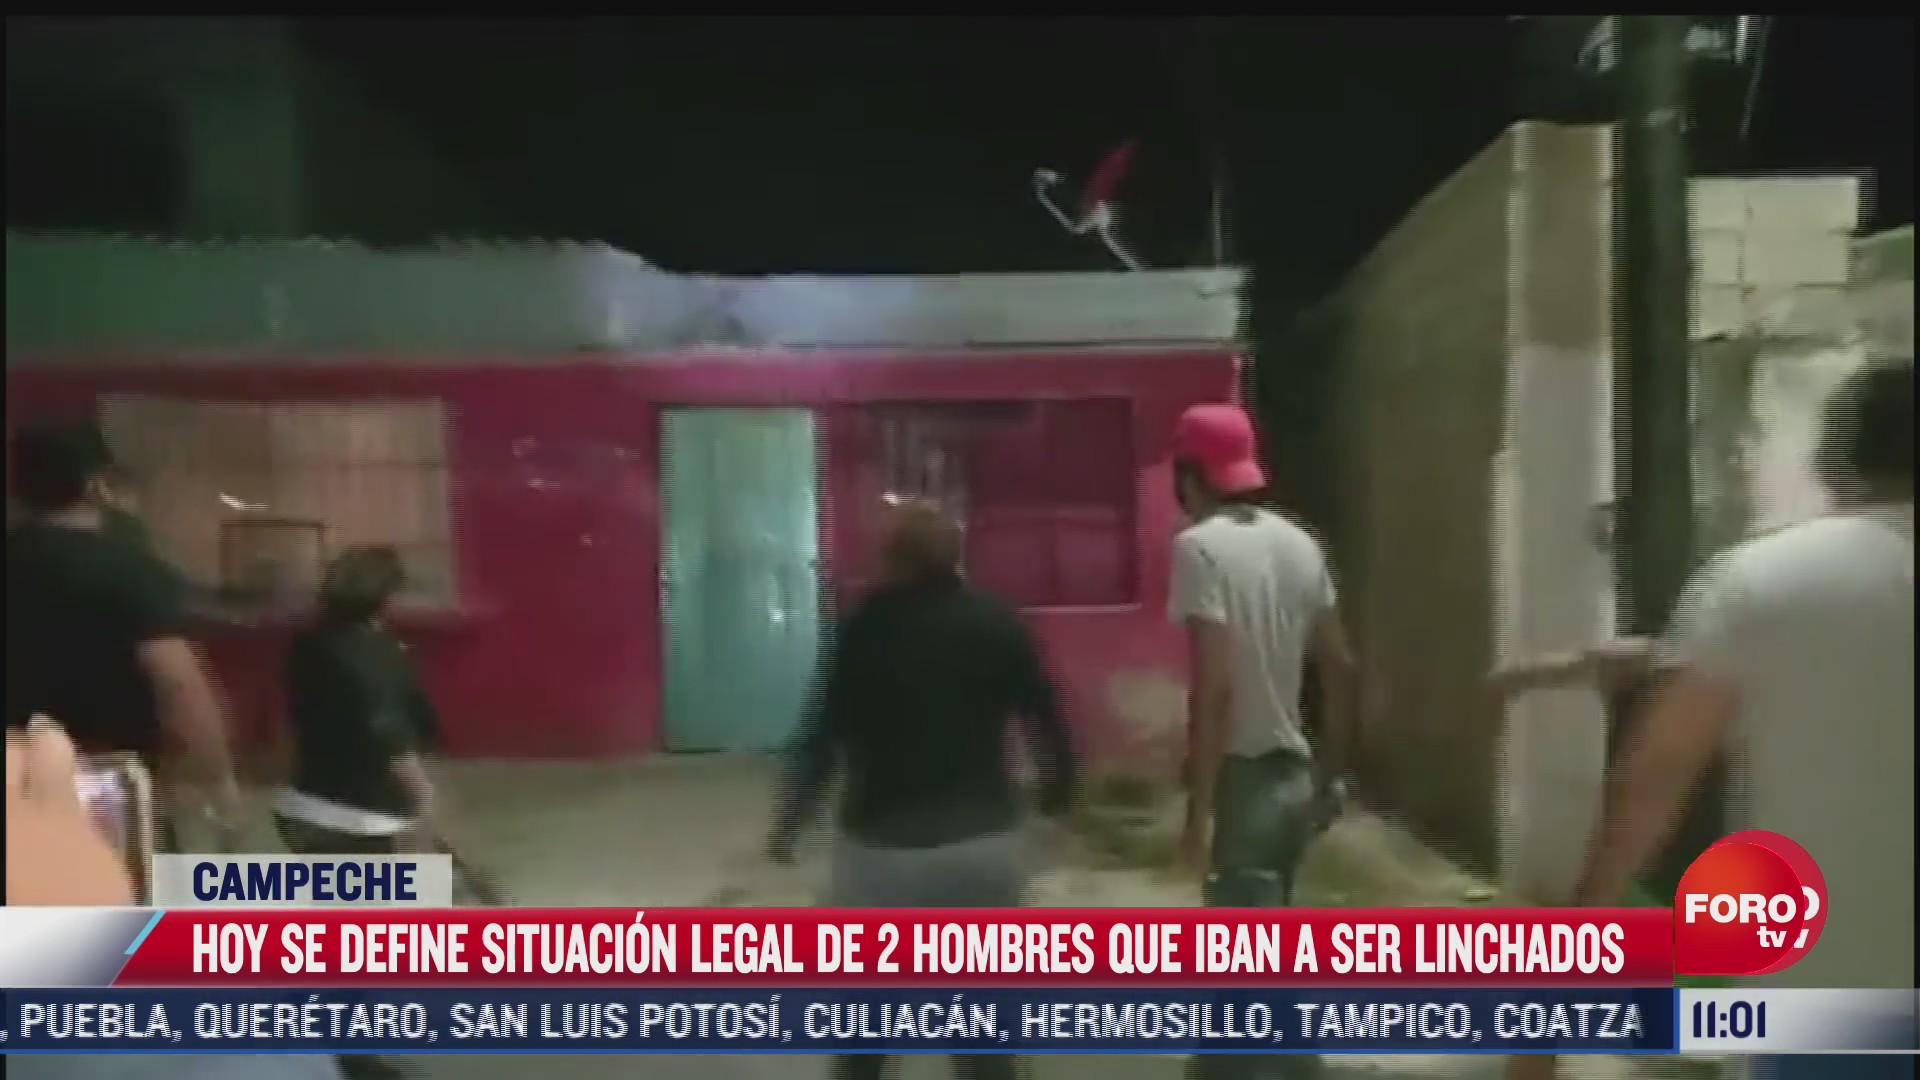 se definira situacion legal de 2 hombres que iban a ser linchados en campeche